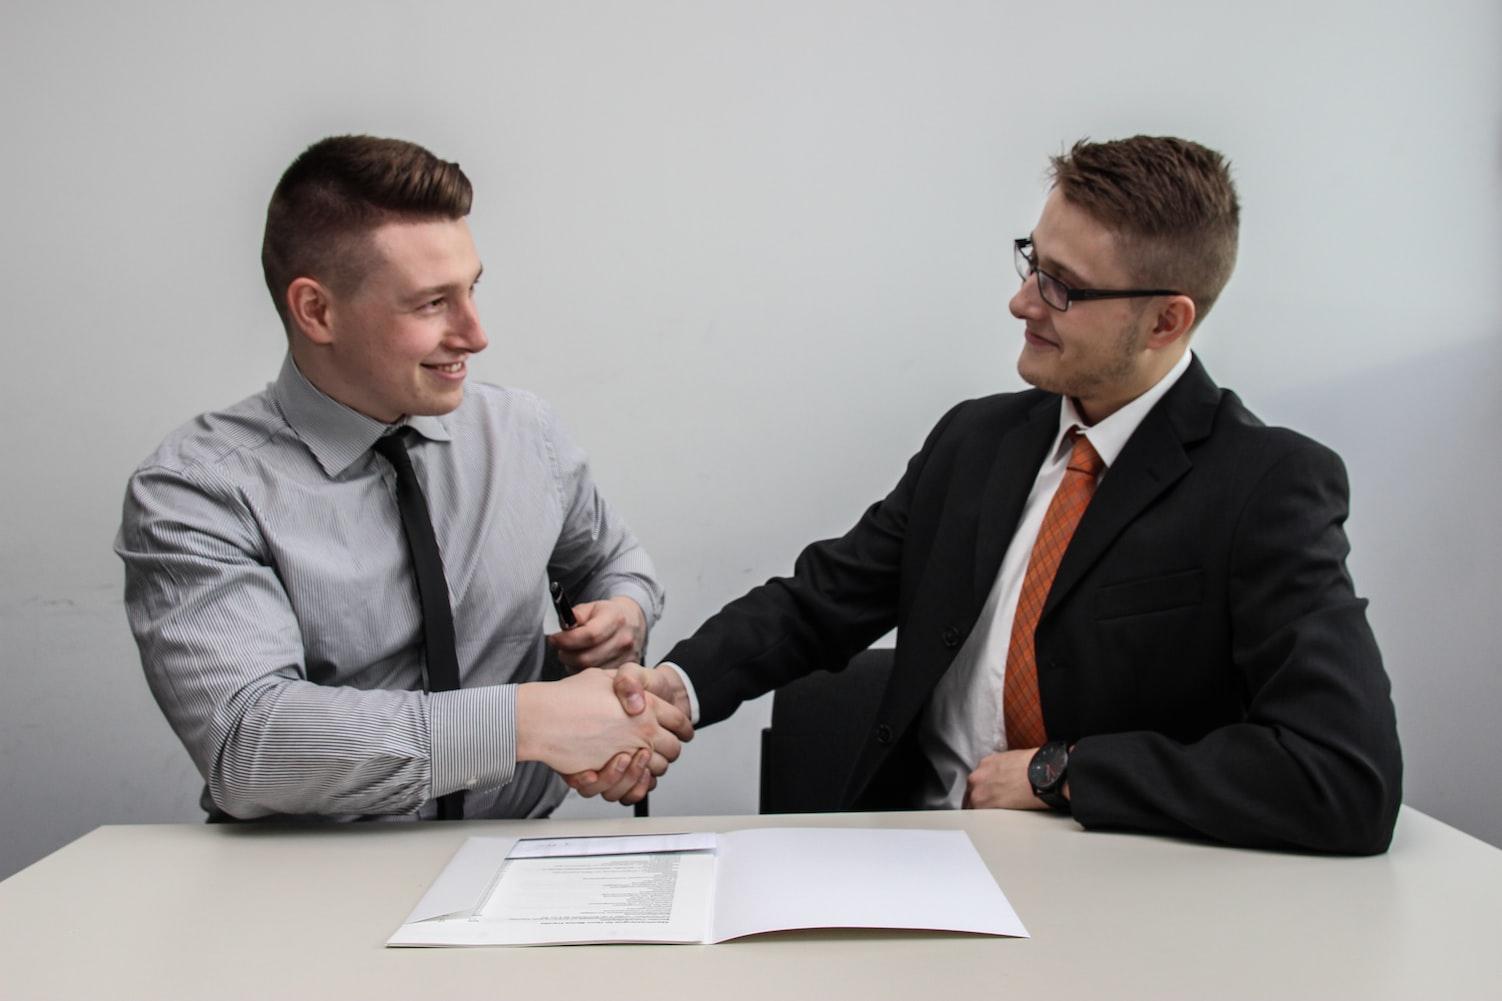 two men shacking hands